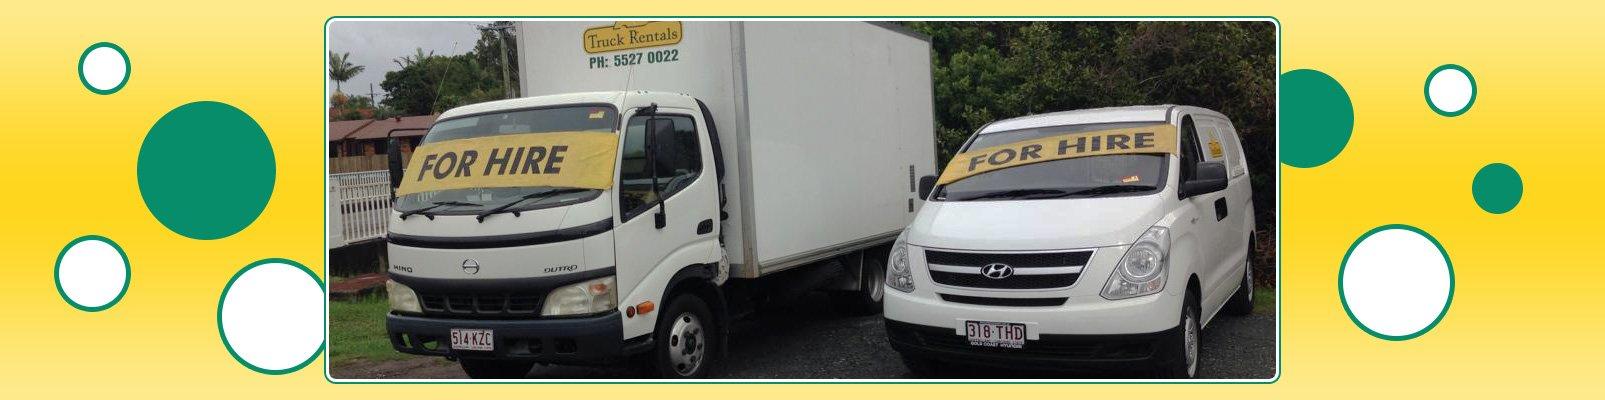 a b truck rentals trucks parked on road